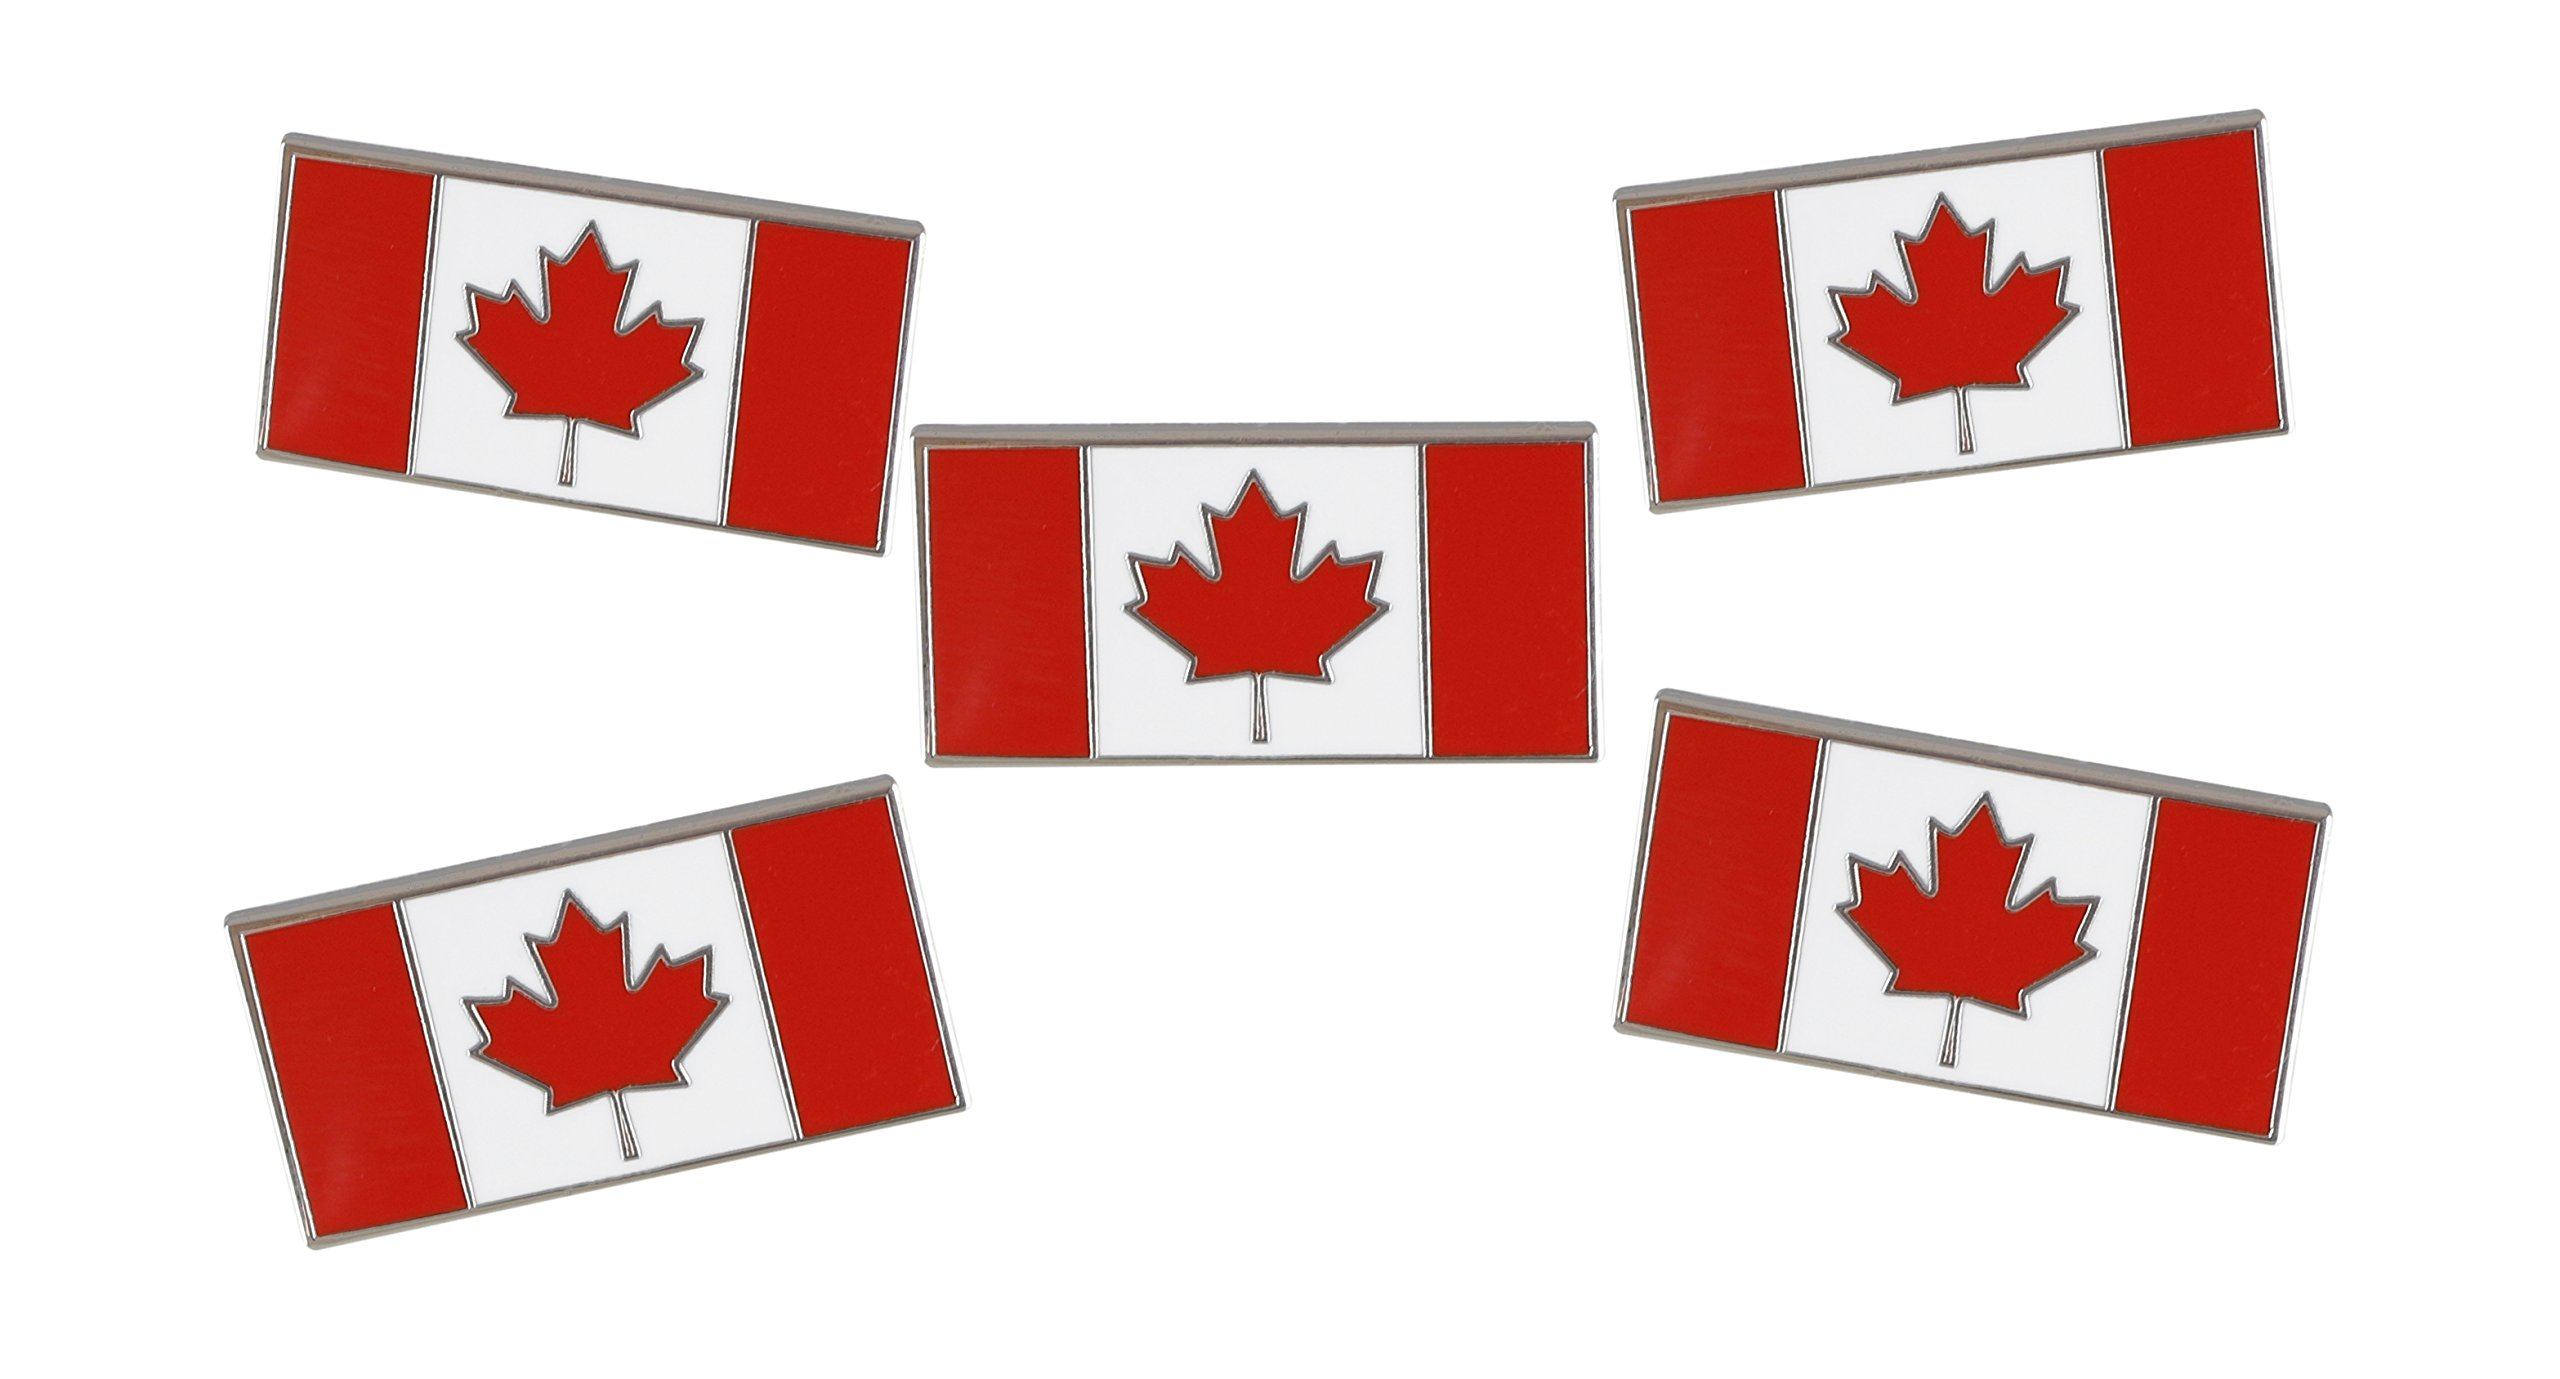 Forge Canadian Flag-Maple Leaf - Enamel Lapel Pins- Bulk (100 Pins) by Forge (Image #4)